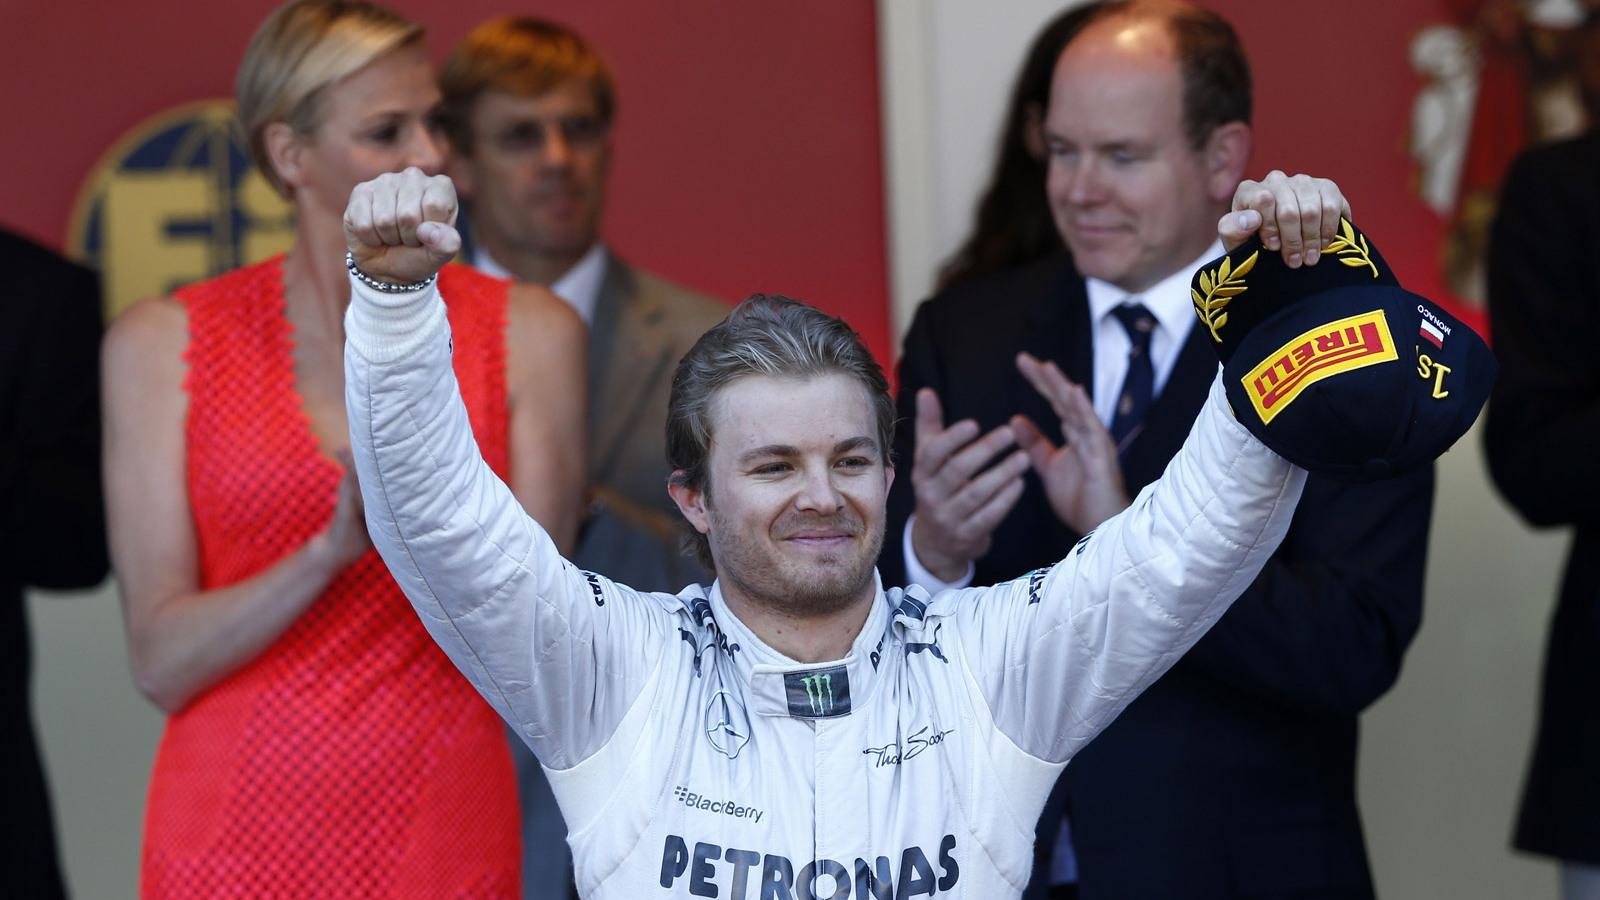 Mercedes AMG's Nico Rosberg after winning the 2013 Formula One Monaco Grand Prix